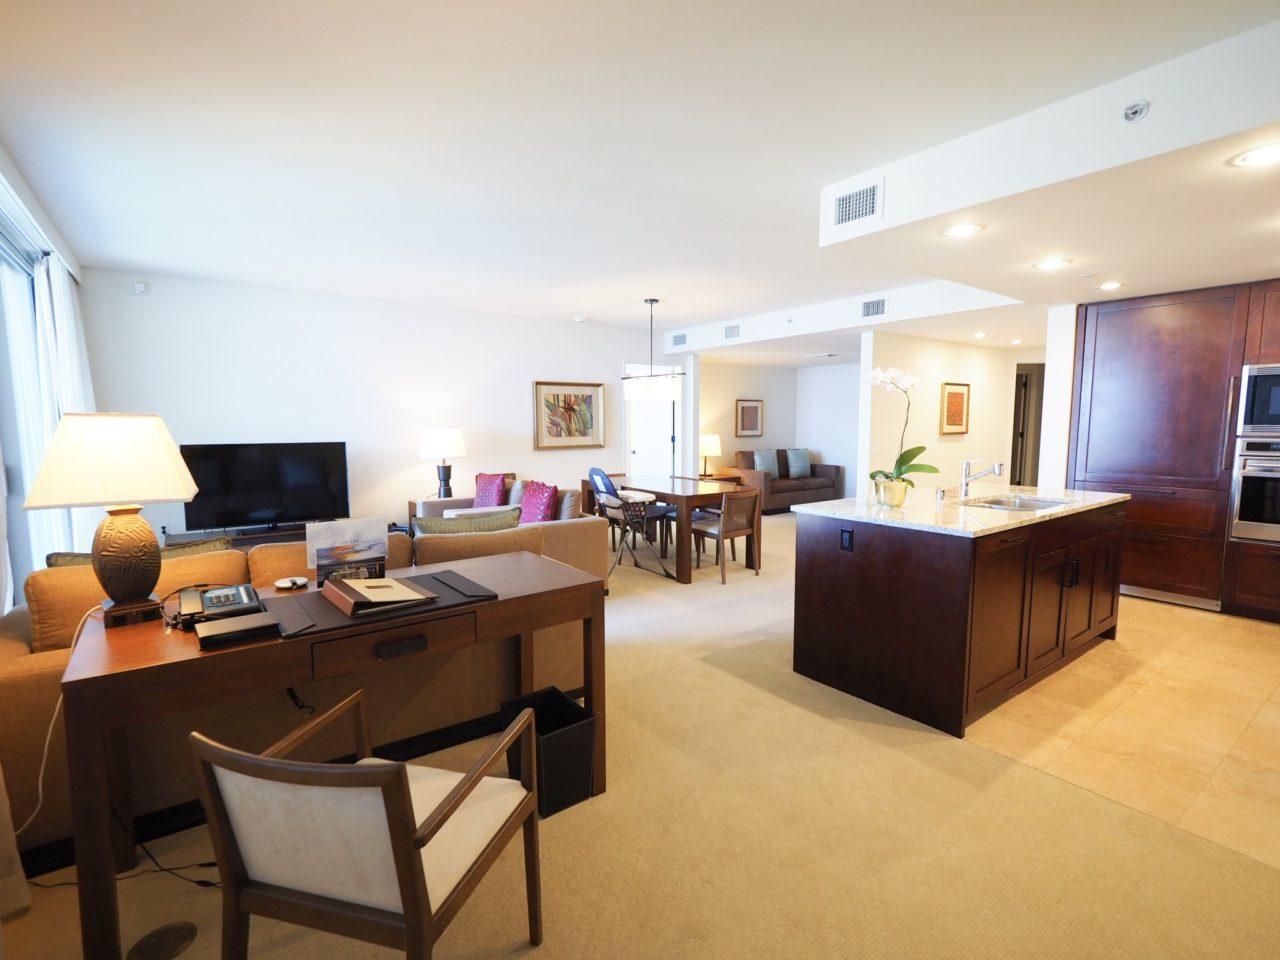 img 4880 - Trump International Hotel Waikiki - ファミリーステイに大満足!トランプ インターナショナル ホテルステイ